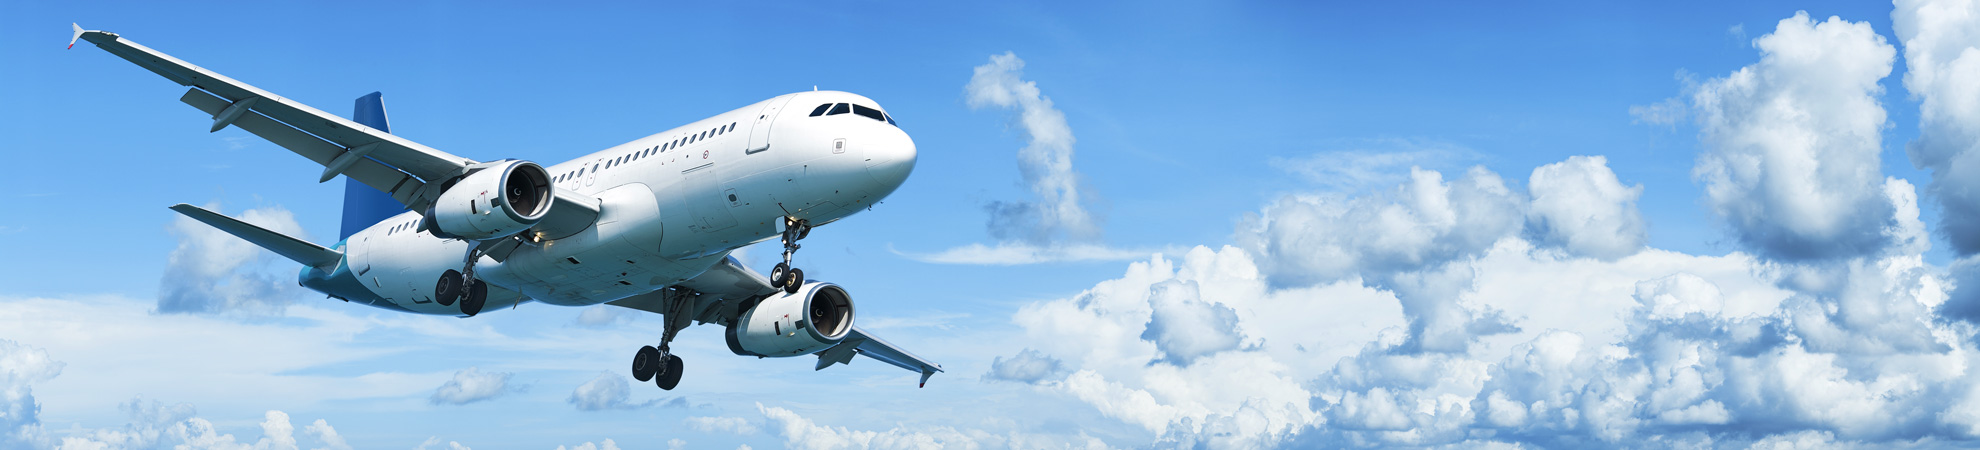 Aller en avion en Chine